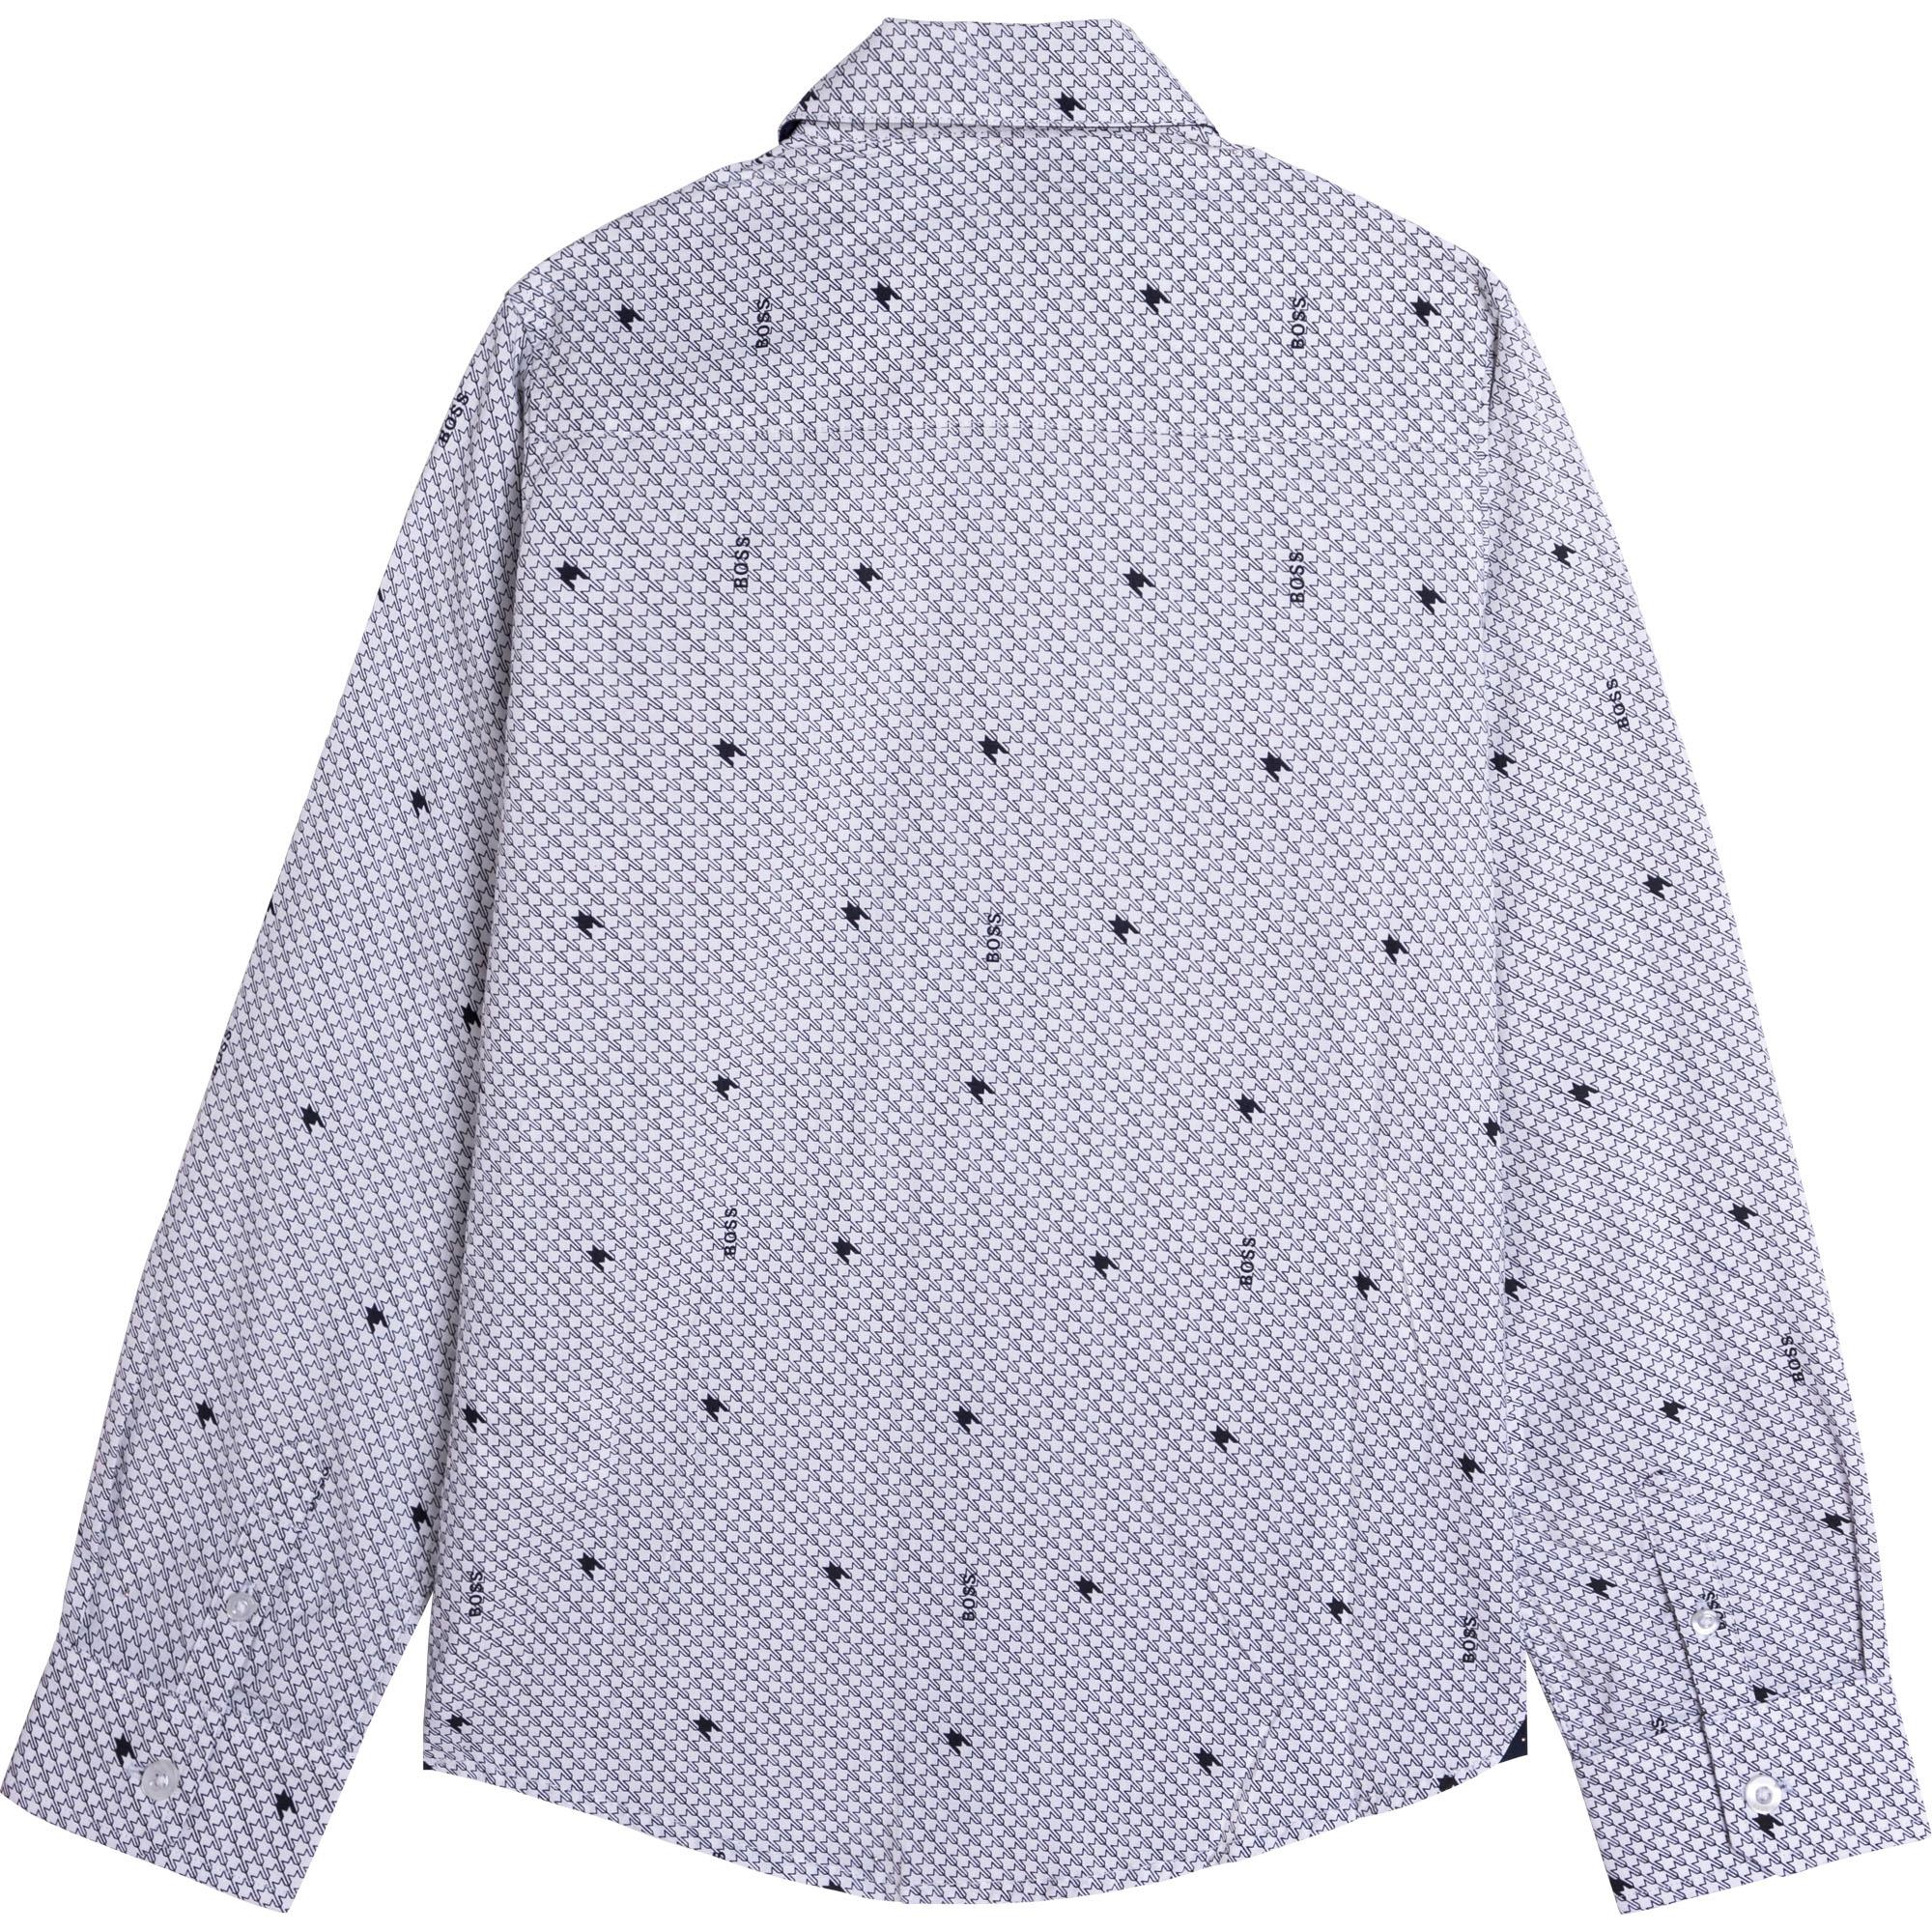 Printed cotton shirt BOSS for BOY